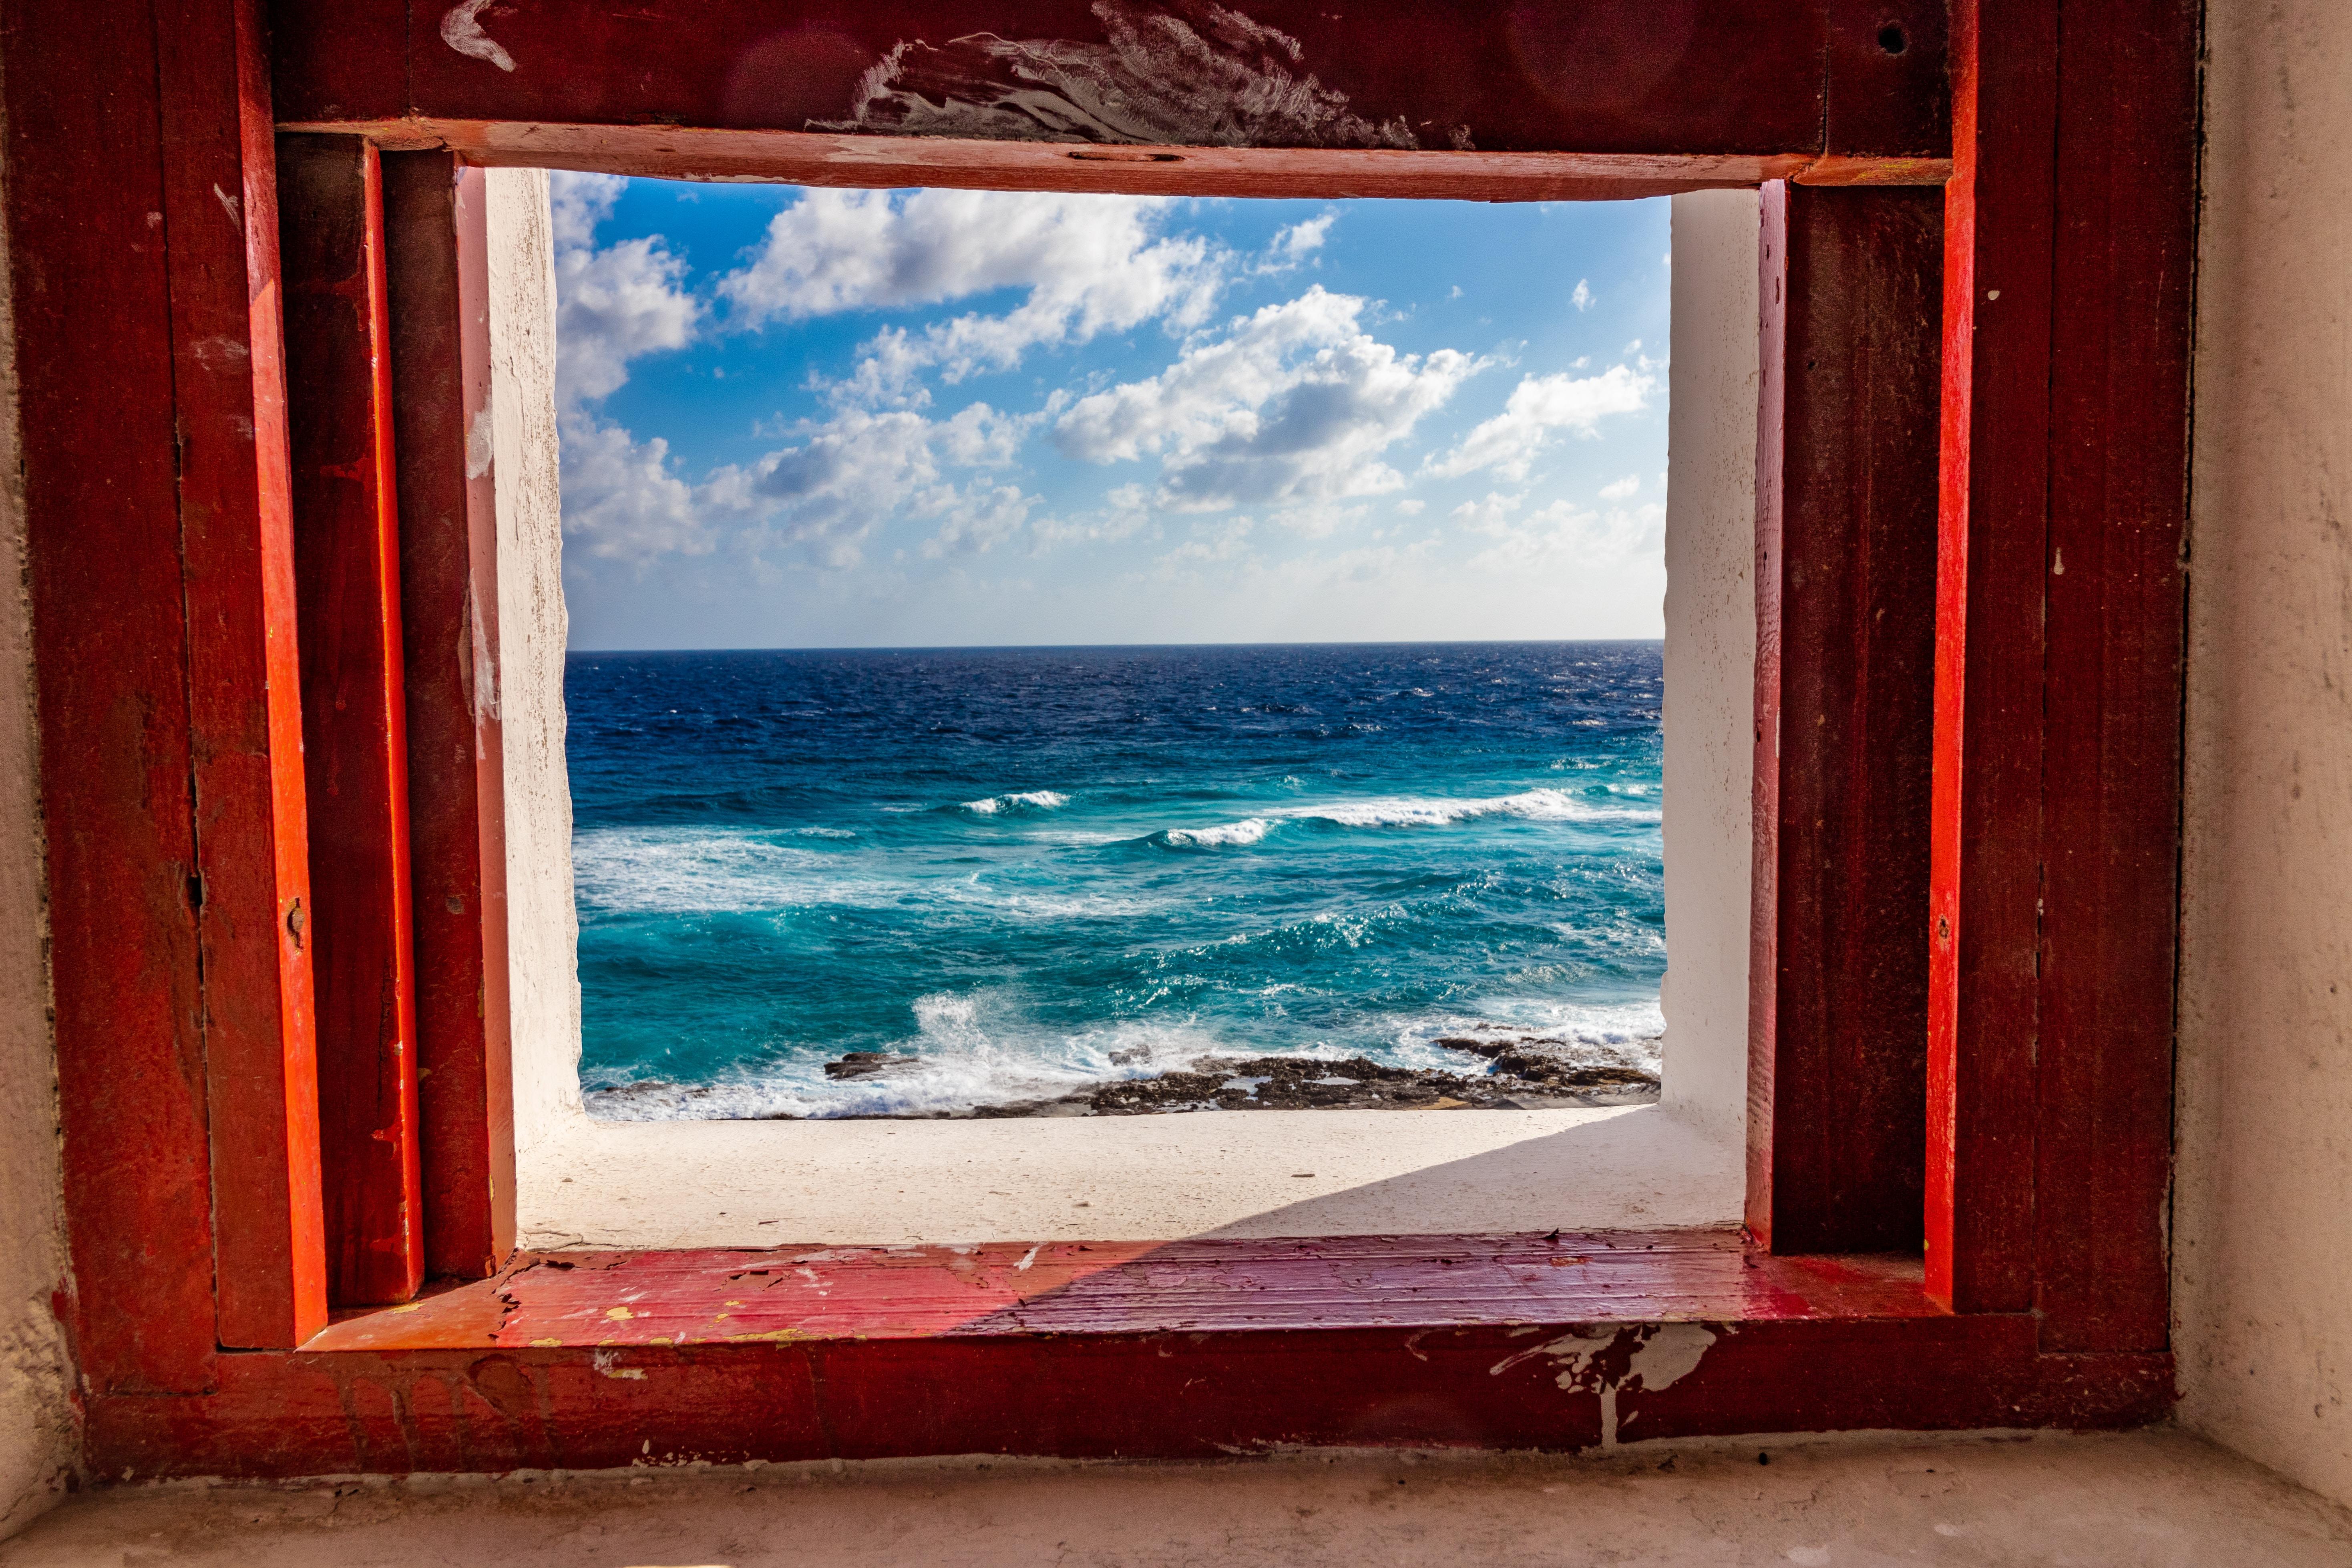 view of the blue ocean through a window